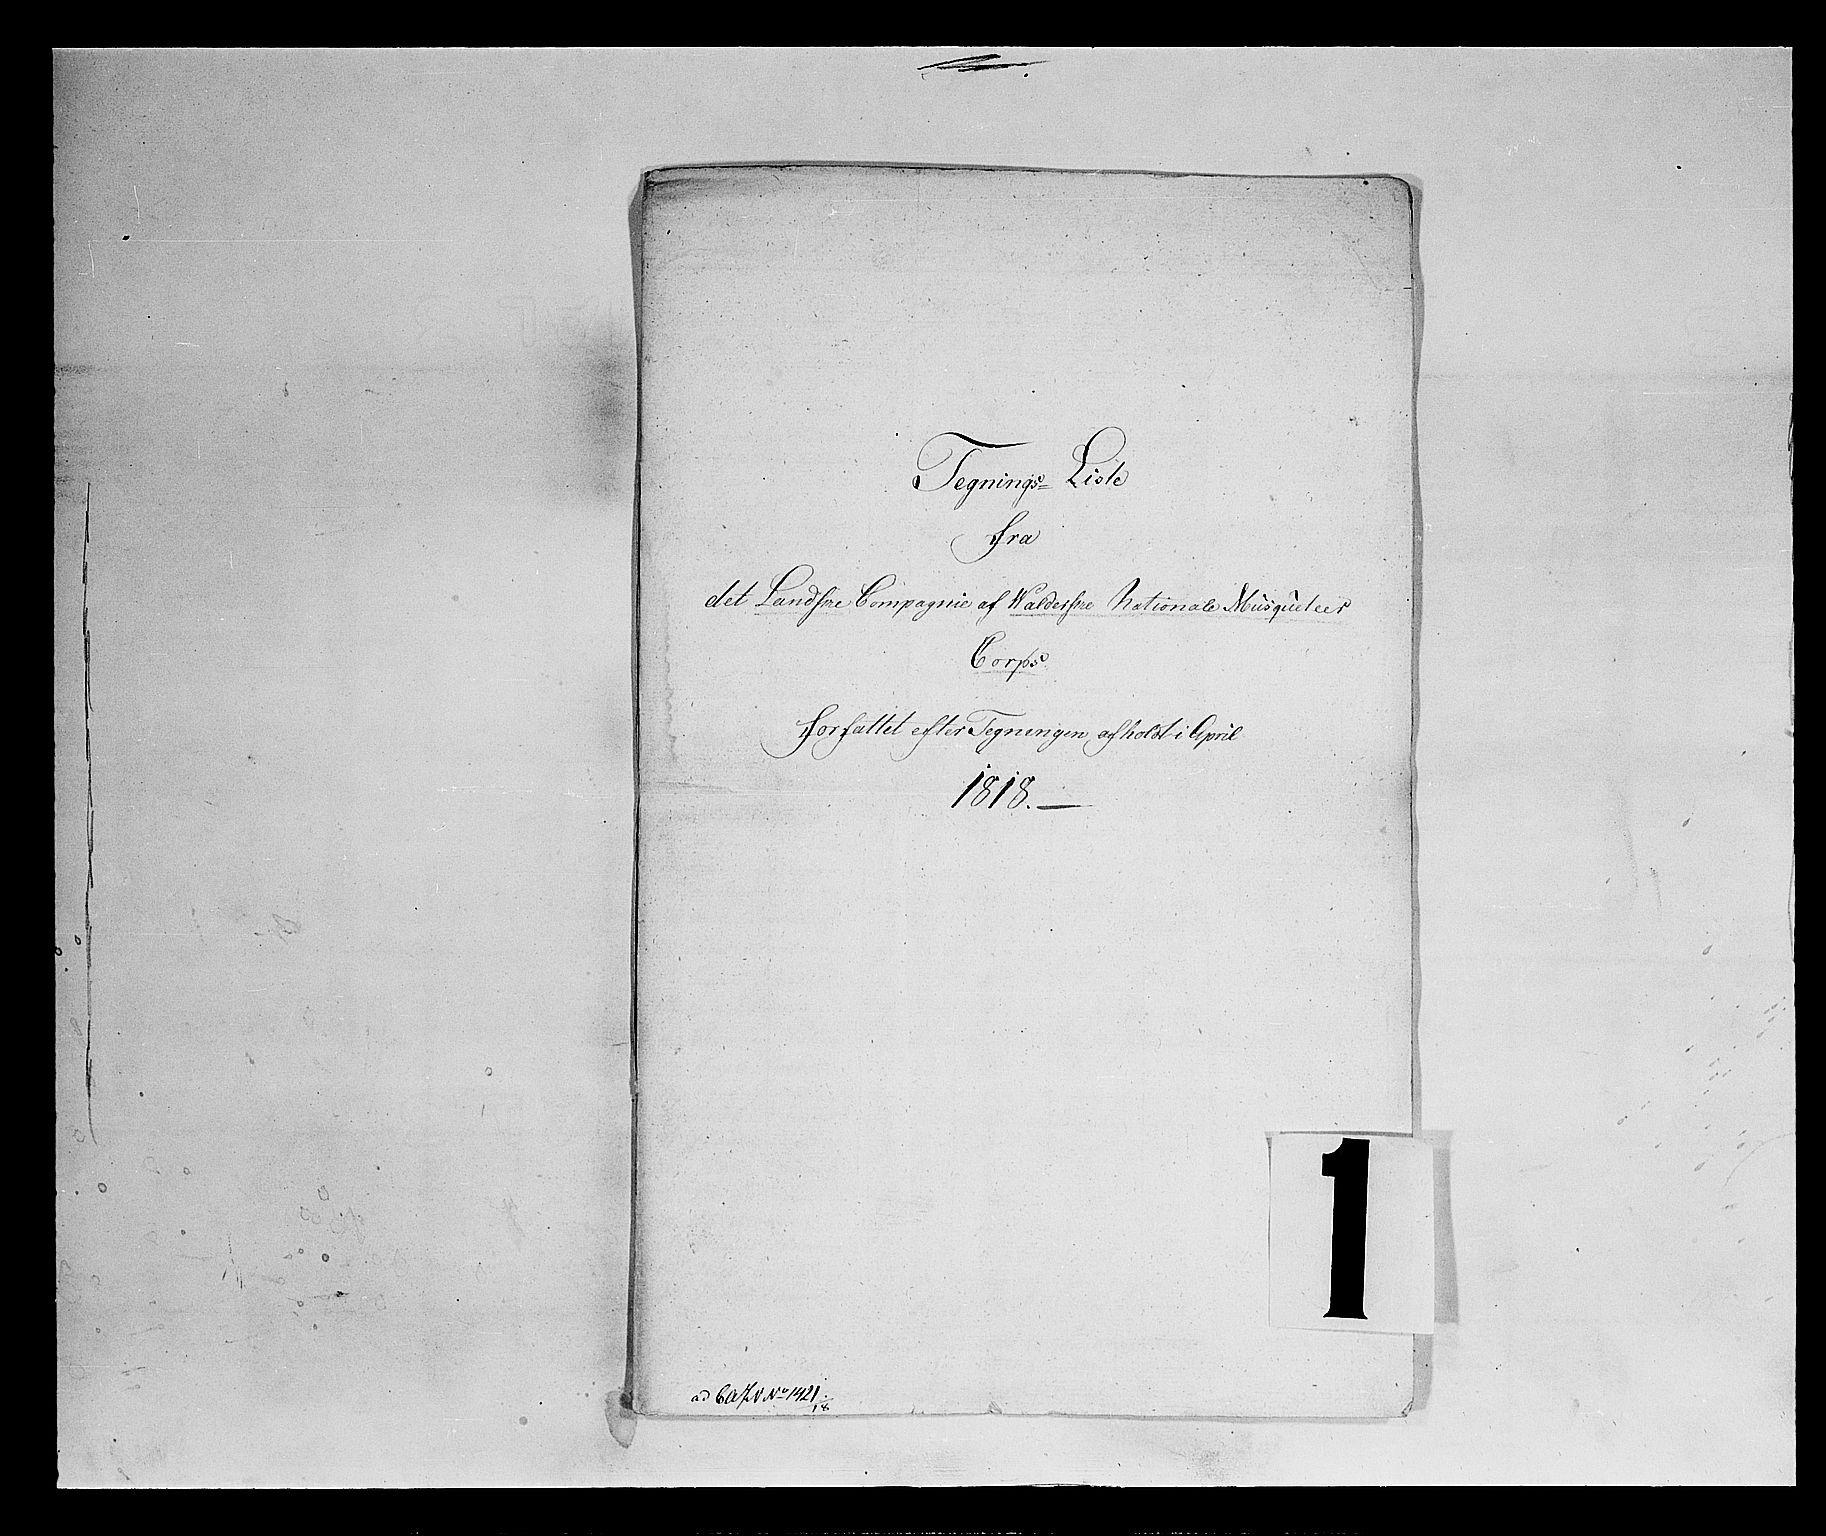 SAH, Fylkesmannen i Oppland, K/Kb/L1158: Valderske nasjonale musketérkorps - Landske kompani, 1818-1860, s. 2